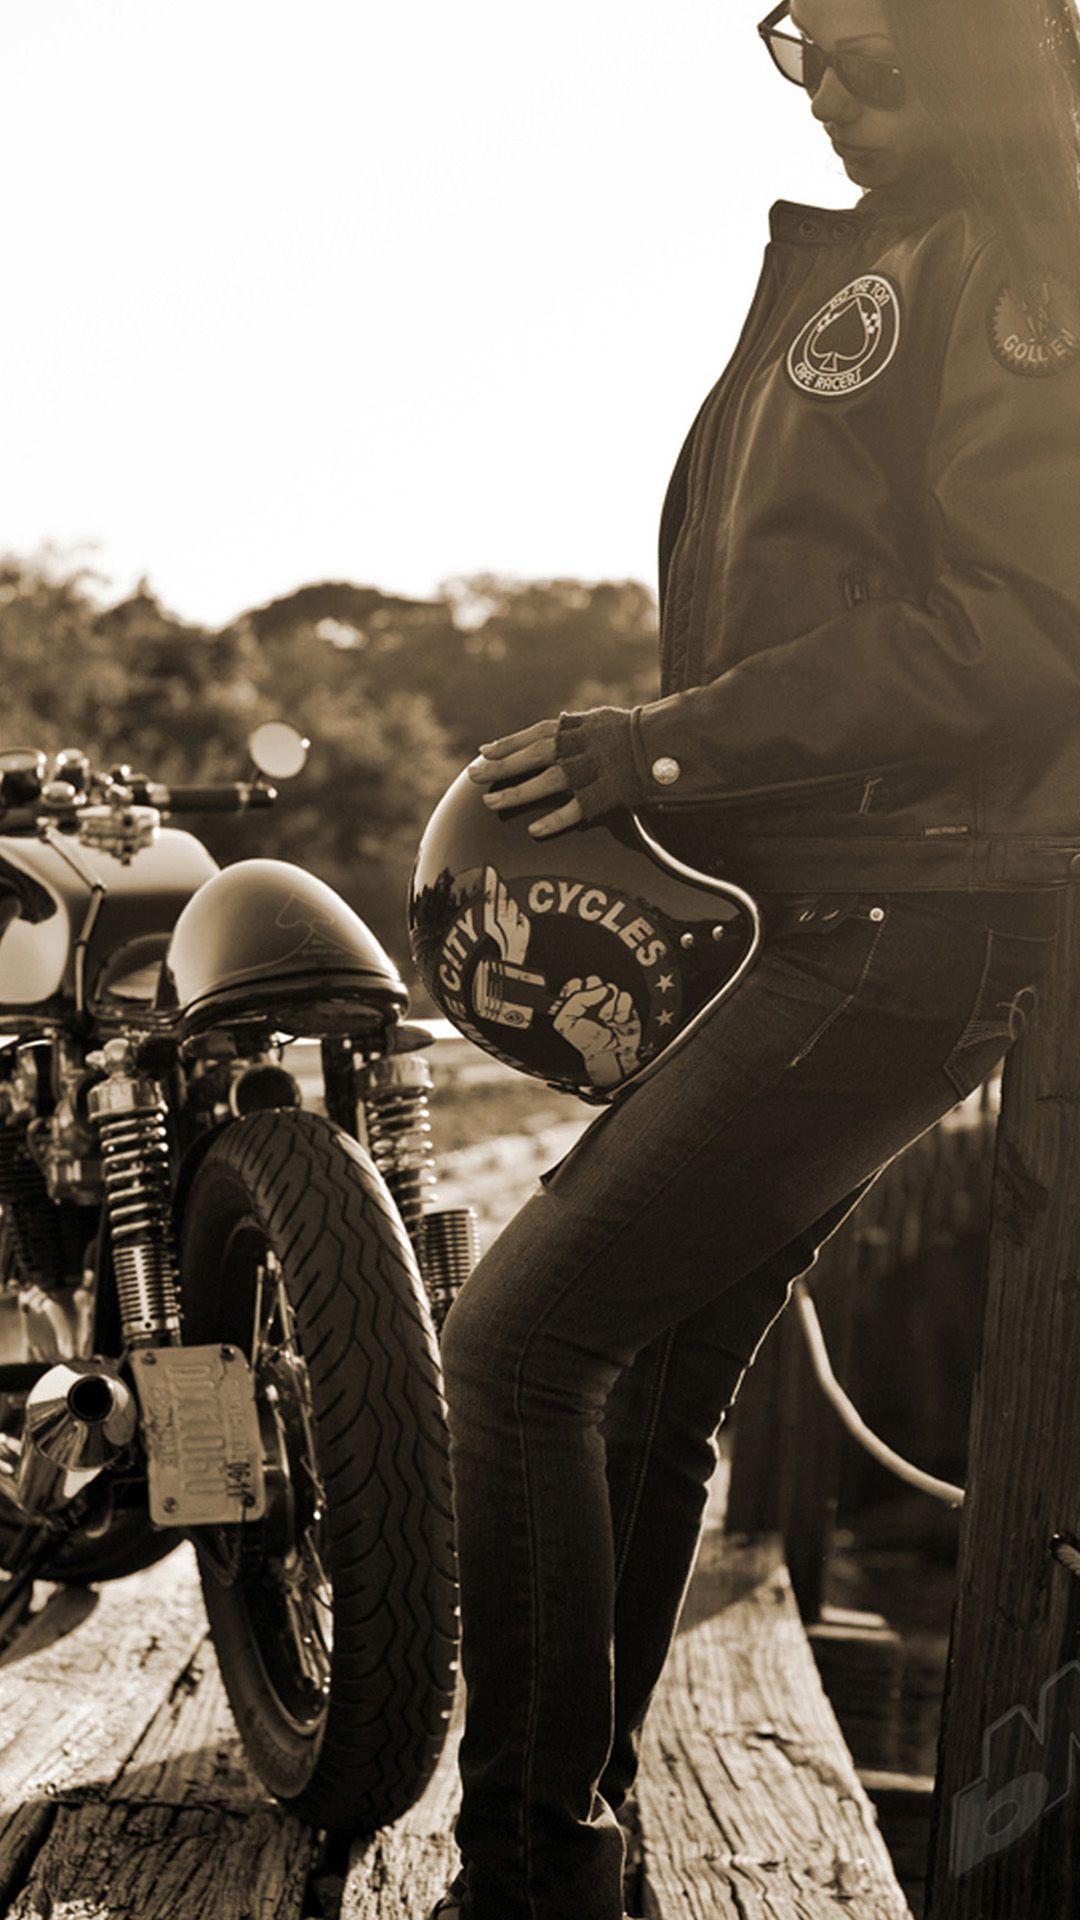 Tell Hardcore biker black girls simply